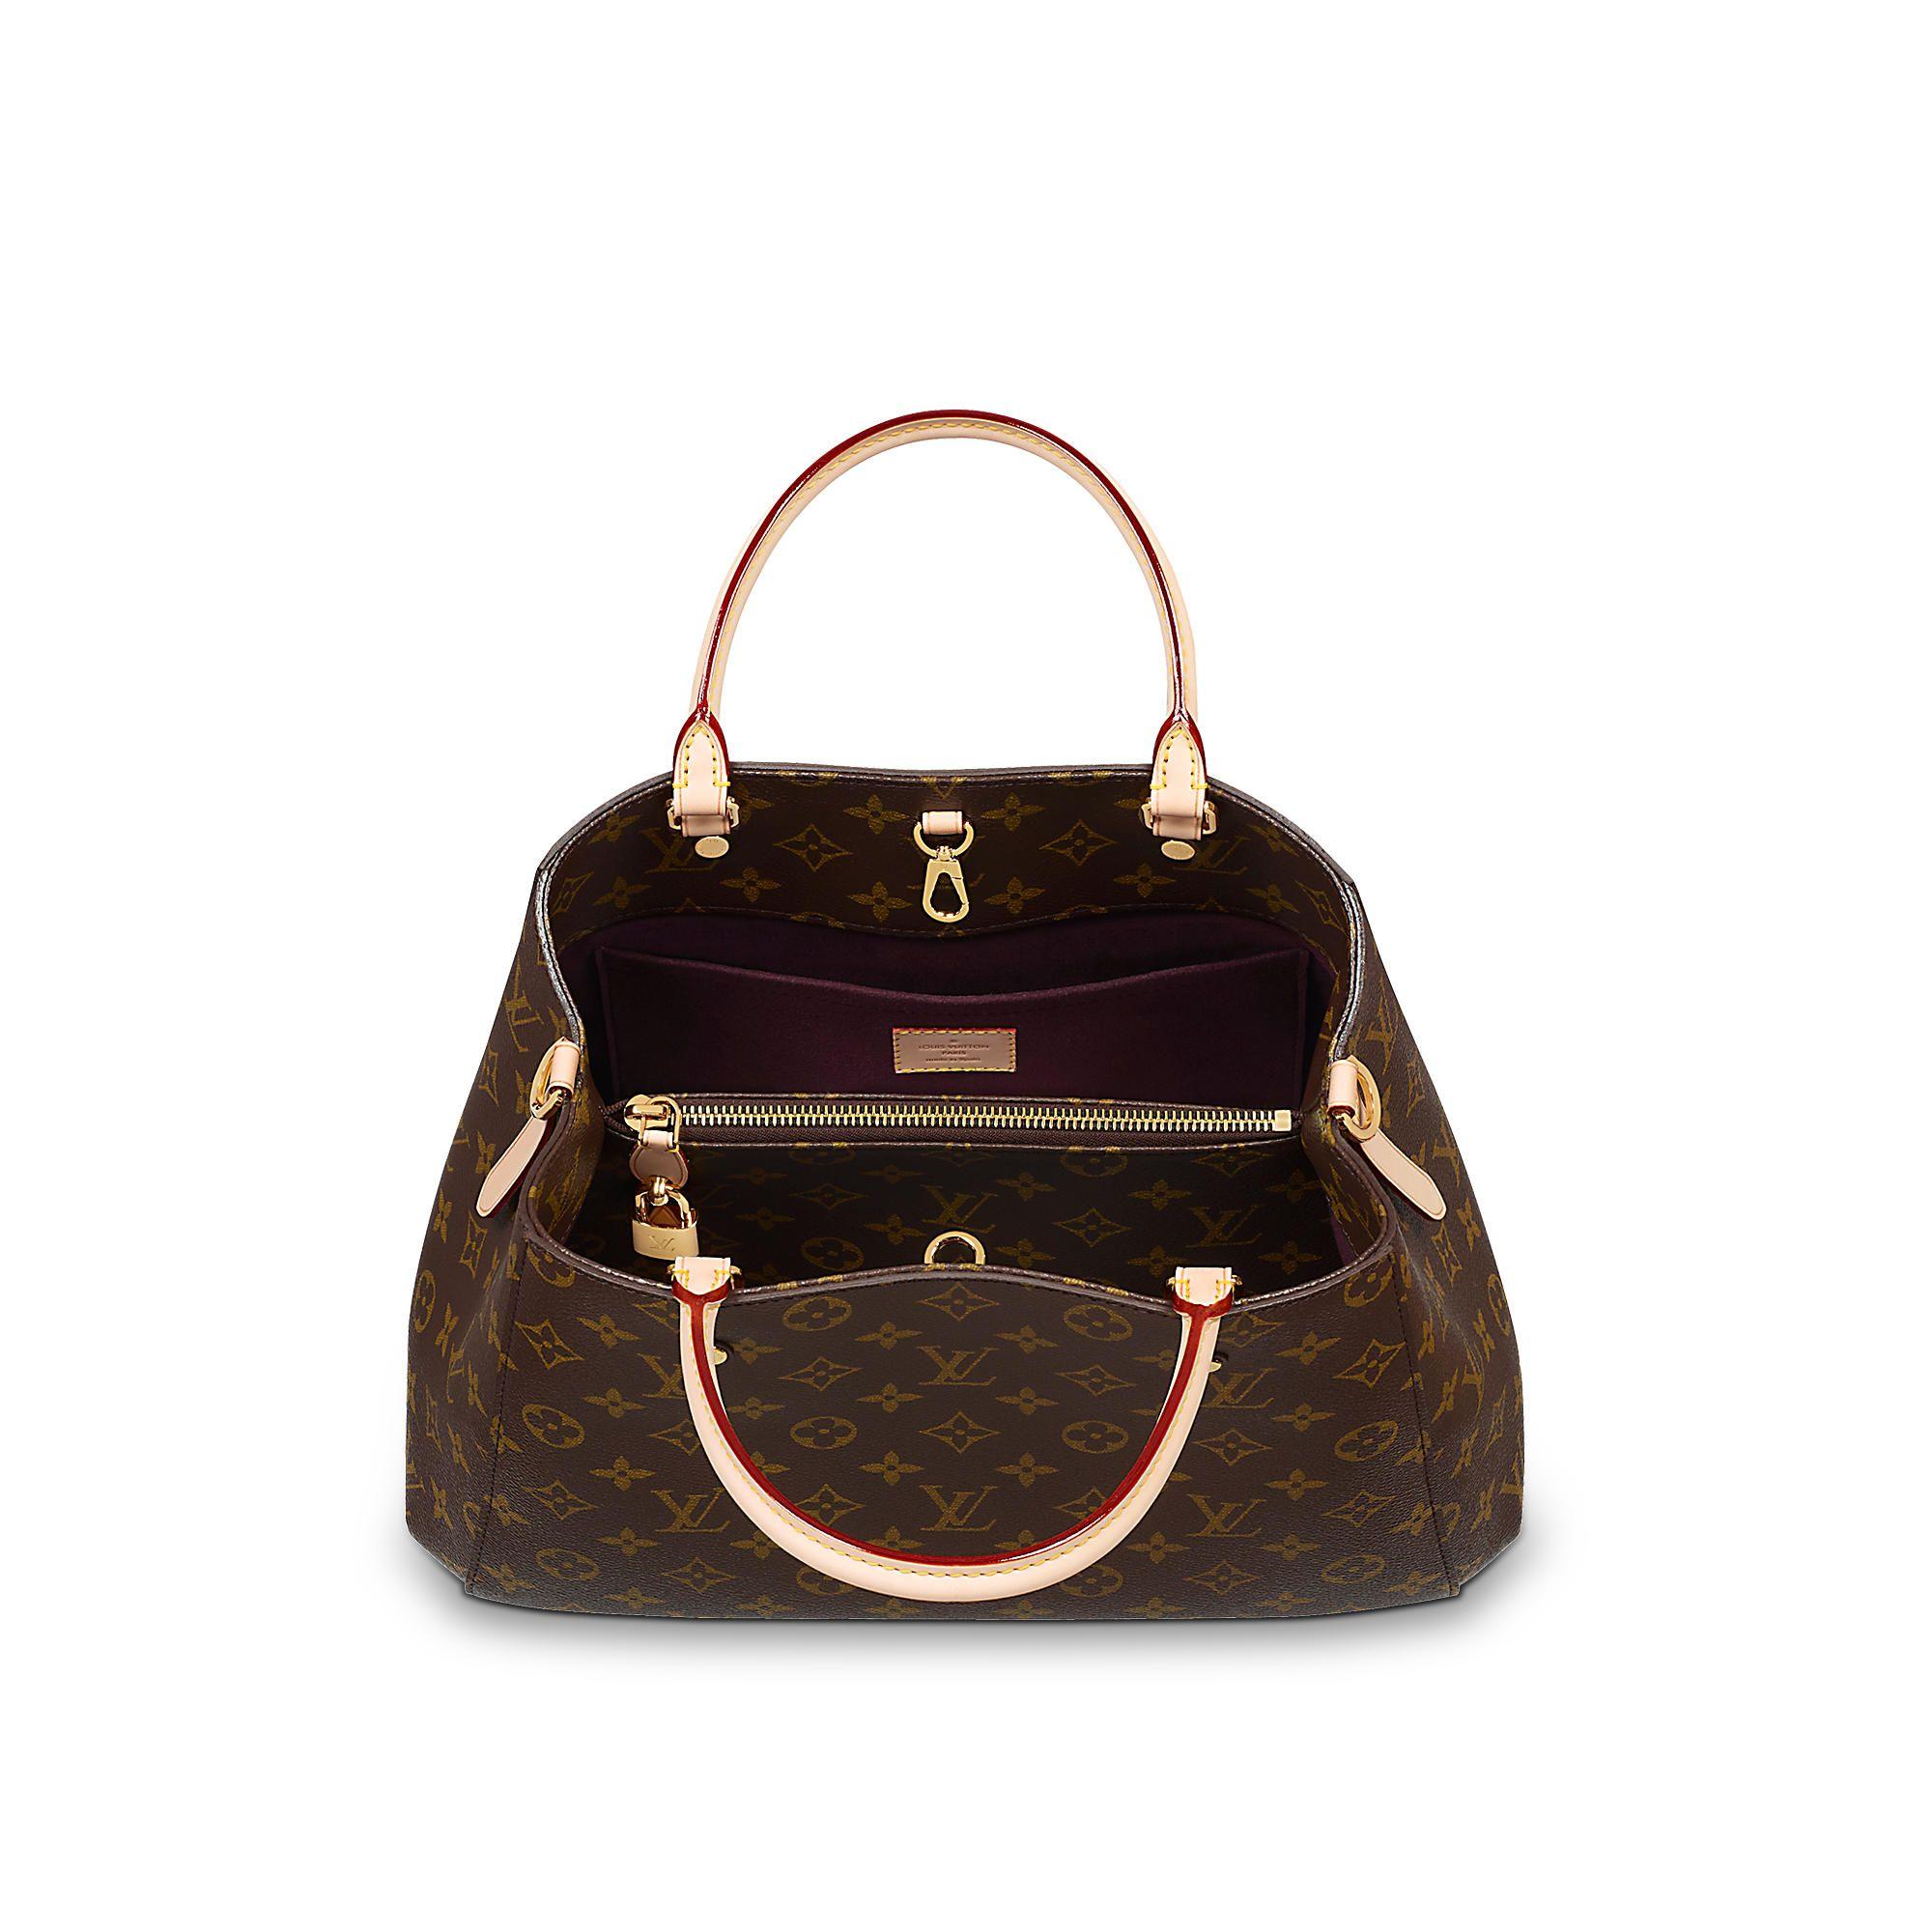 Image result for Louis Vuitton Montaigne Bag